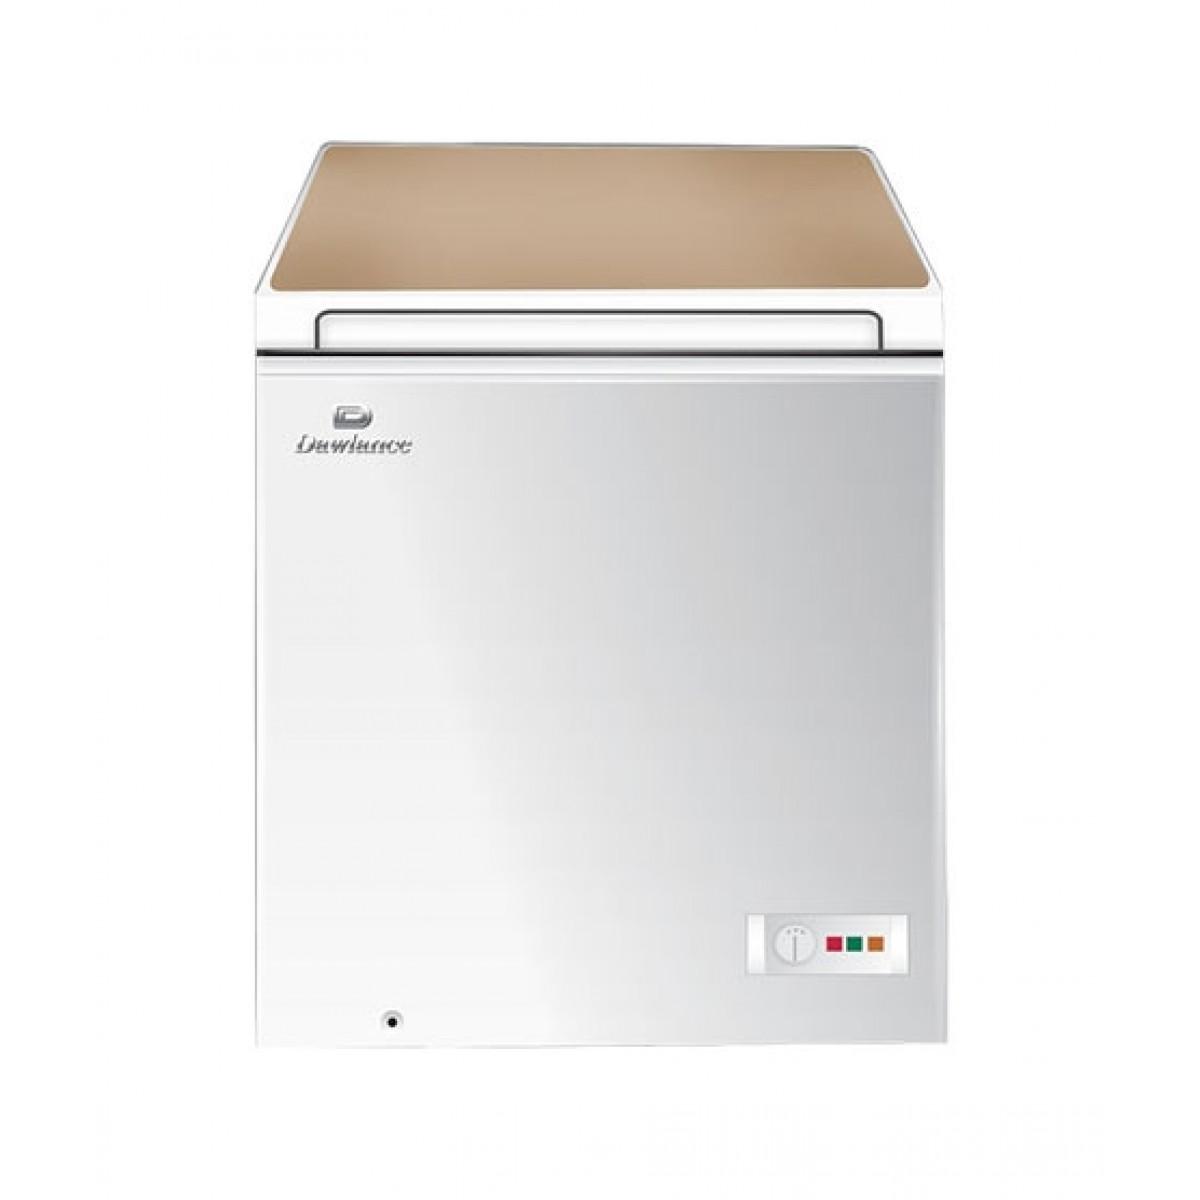 Dawlance Single Door Deep Freezer 7 Cu Ft (DF-200 GD)